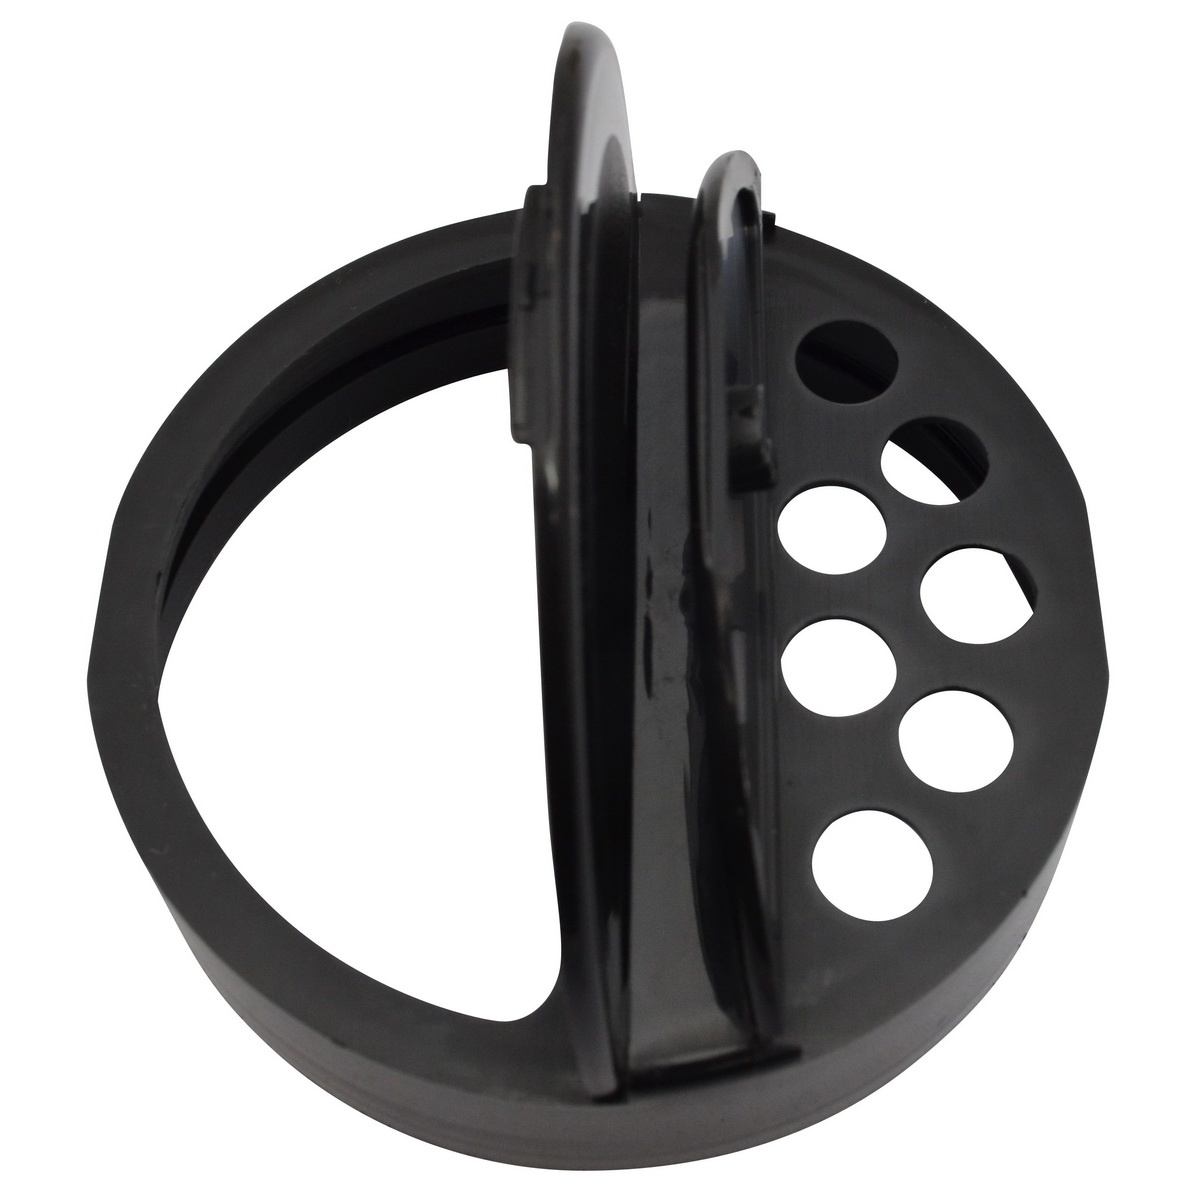 Strooibus kunststof 850 ml met zwarte deksel